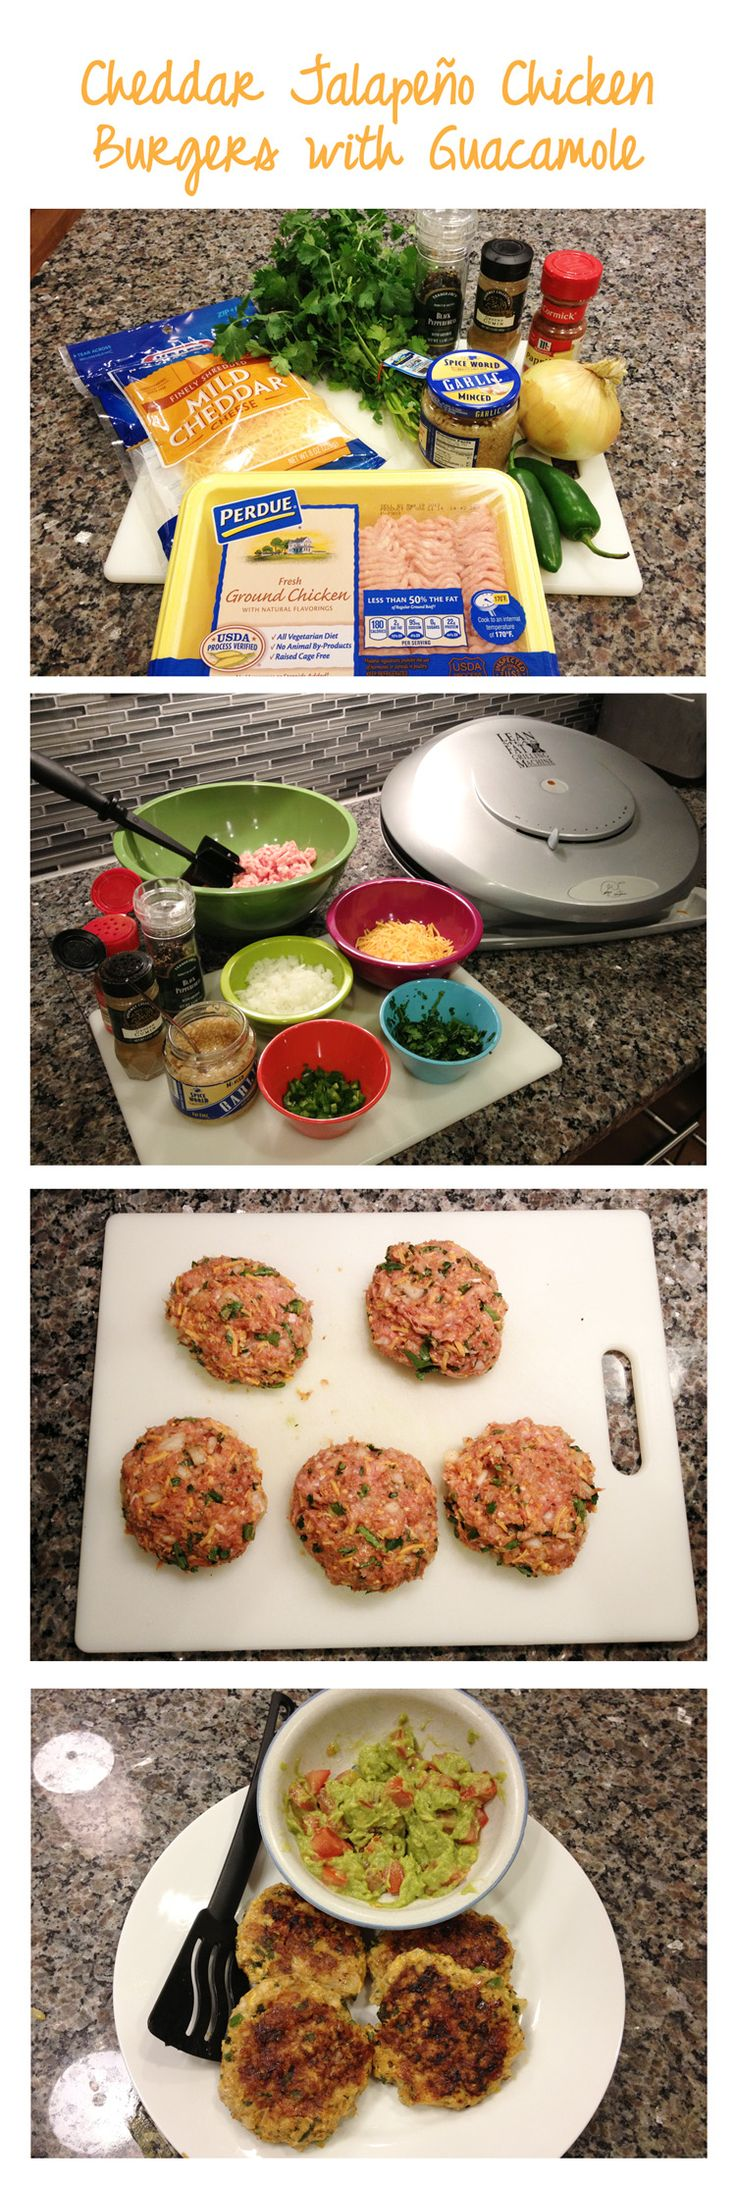 Cheddar Jalapeno Chicken Burger Recipe